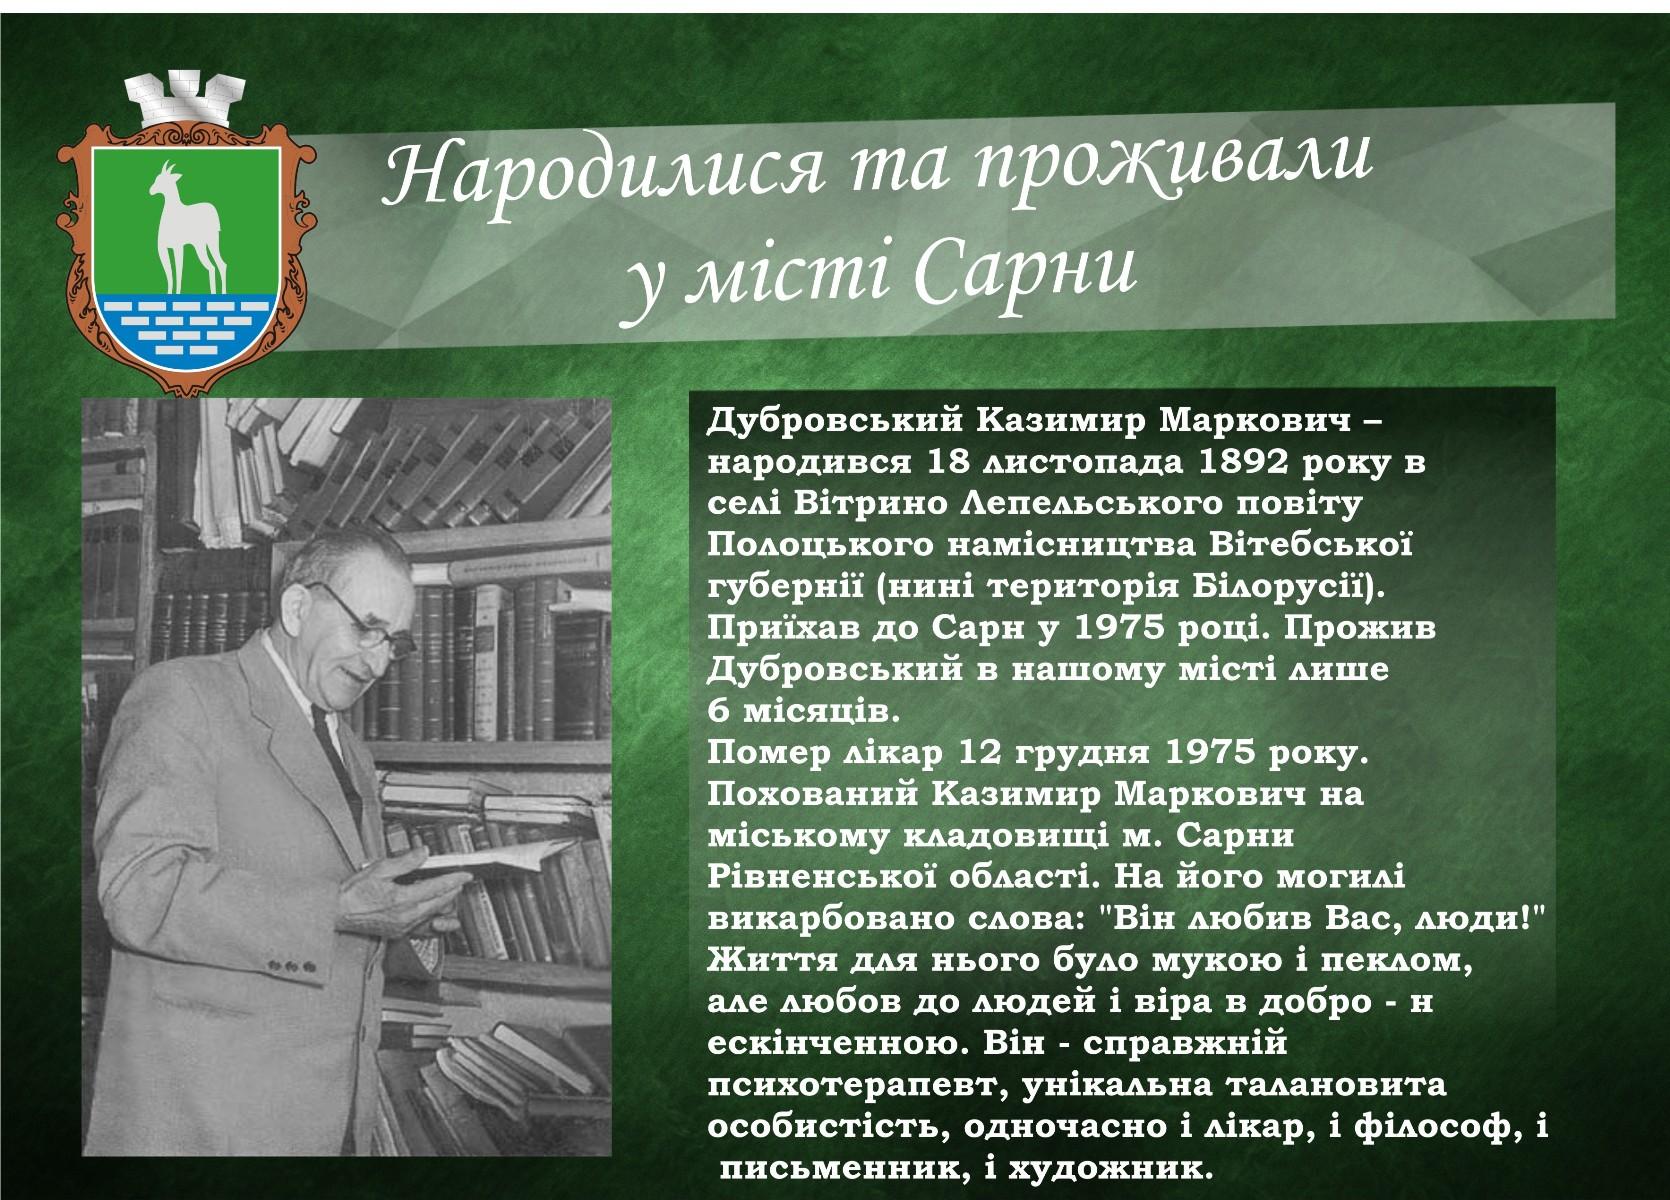 Дубровський Казимир Маркович